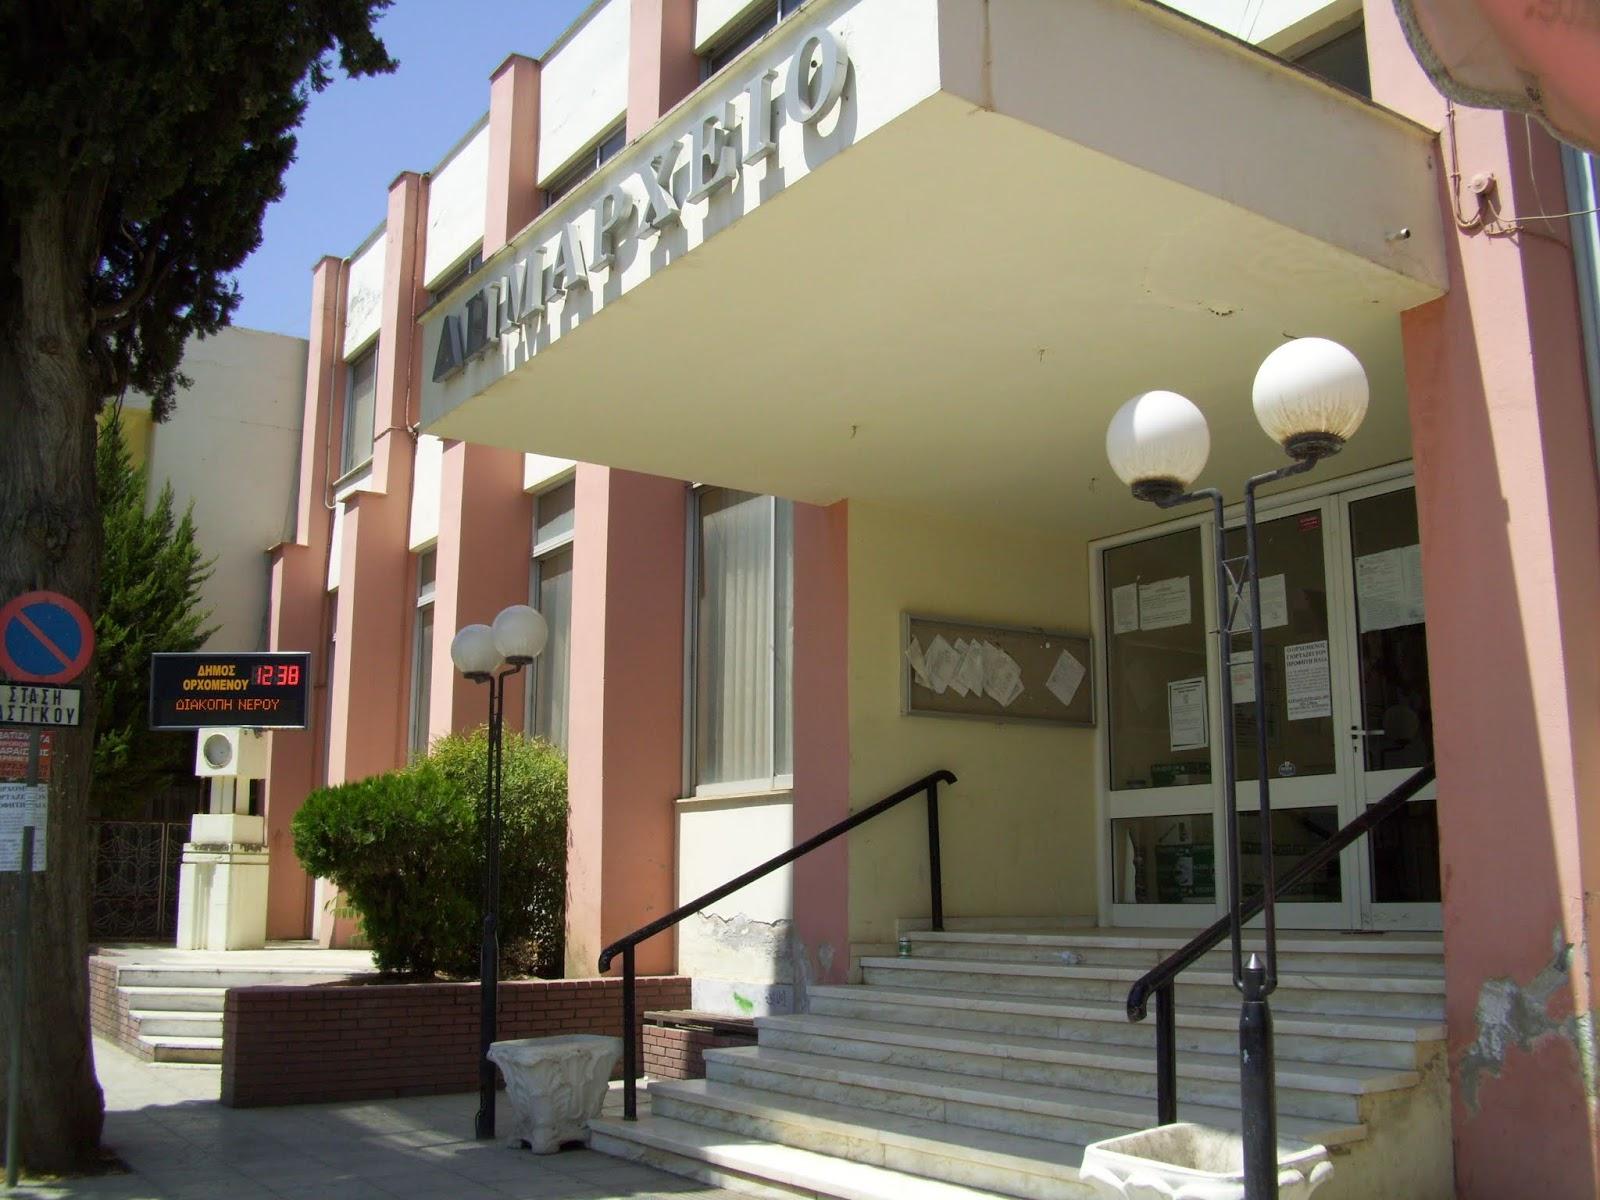 ORCHOMENOS-PRESS: Δημοτικές εκλογές 2019 – Δήμος Ορχομενού: Τα δεδομένα και  «τ96; αγκάθια» για εκείνους που φιλοδοξούν ν96; ανέβουν τα… σκαλιά του  Δημαρχείου!